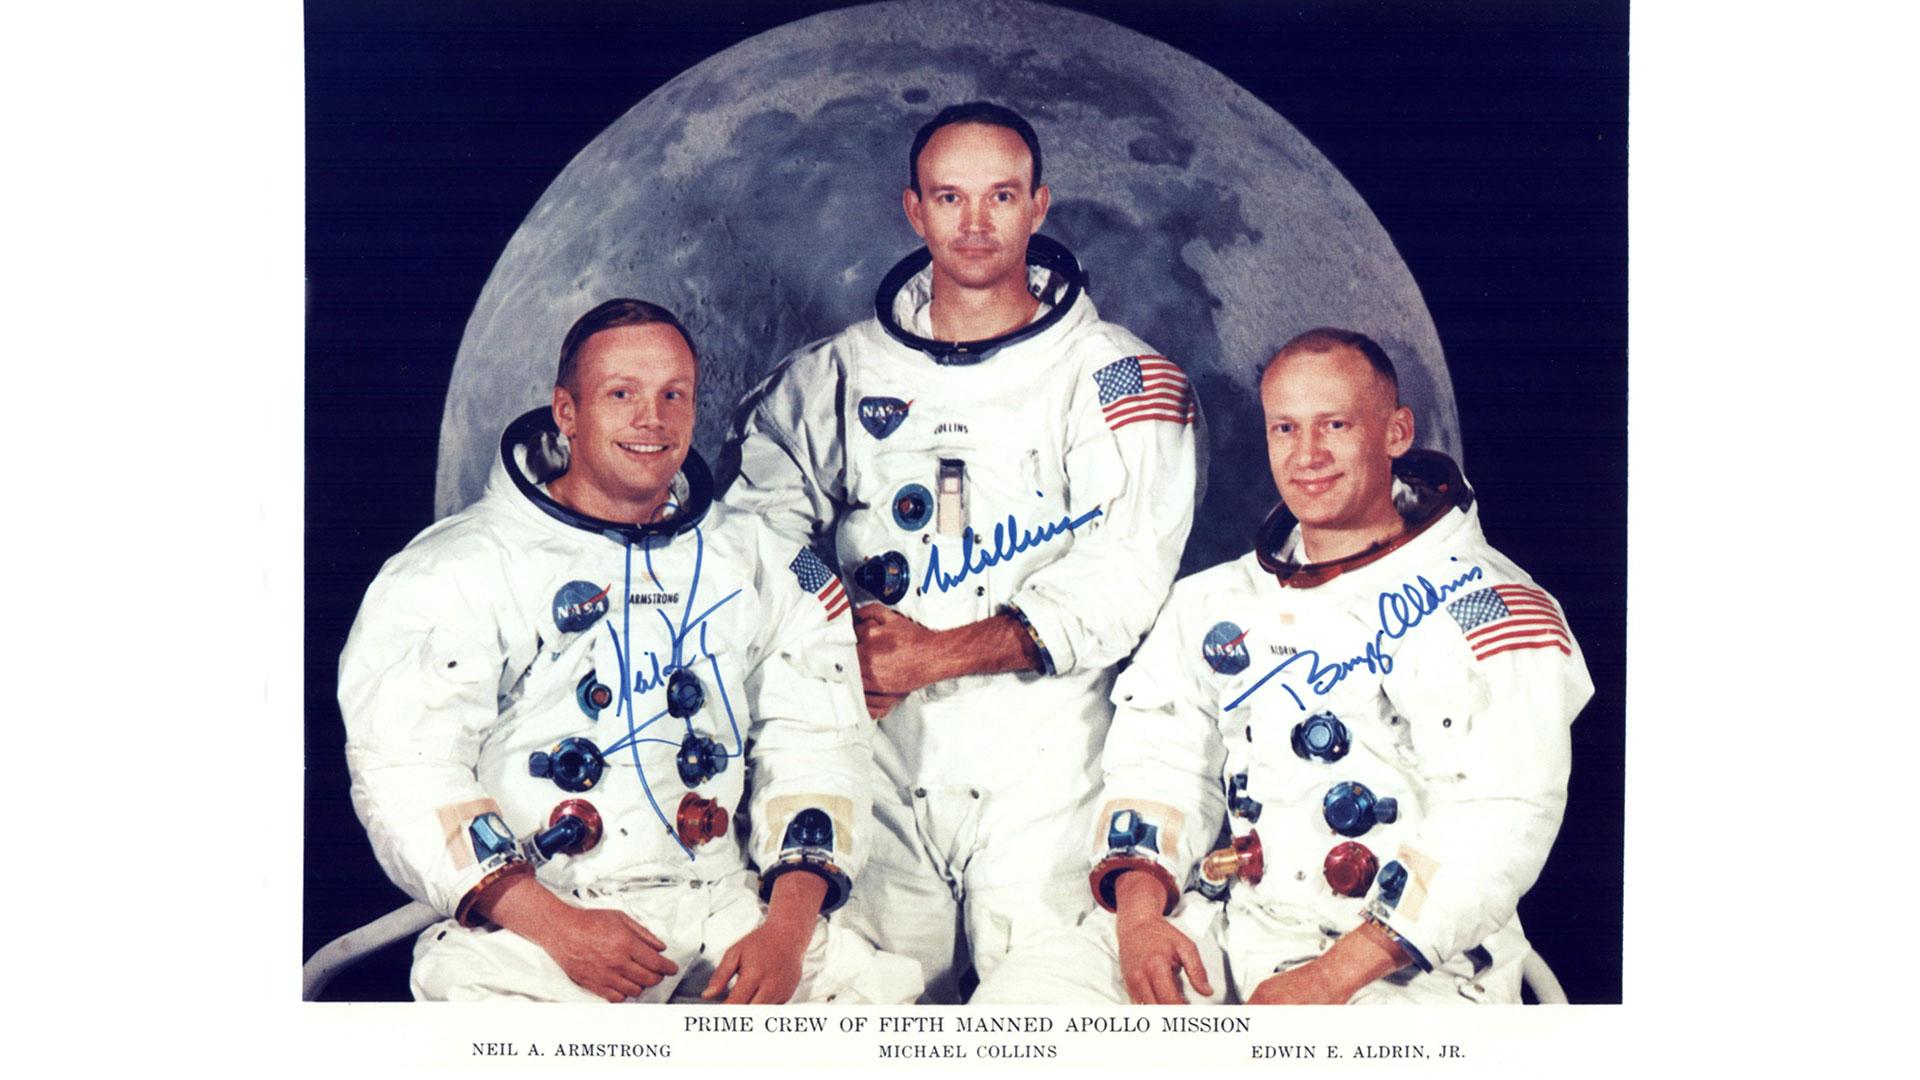 allunaggio-man-on-moon-50-anni-50-years-neil-armstrong